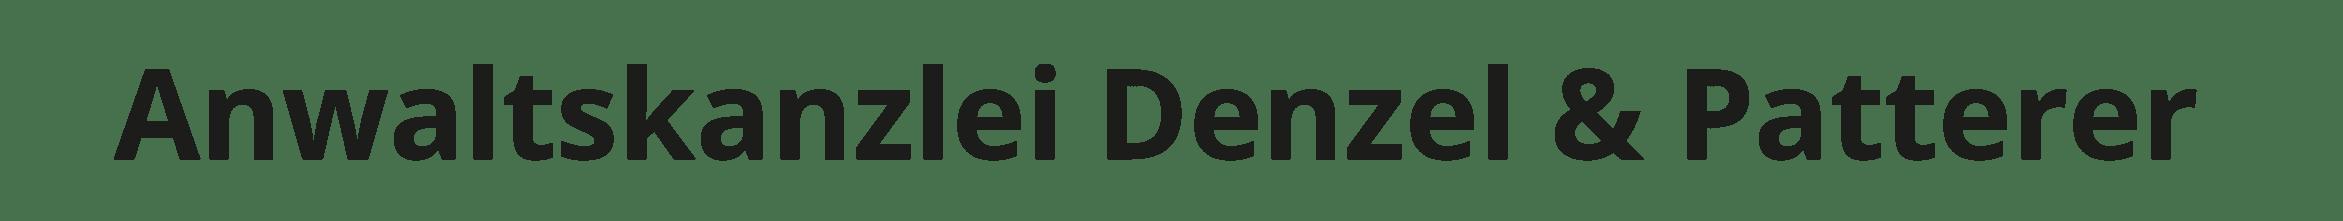 Anwaltskanzlei Denzel & Patterer